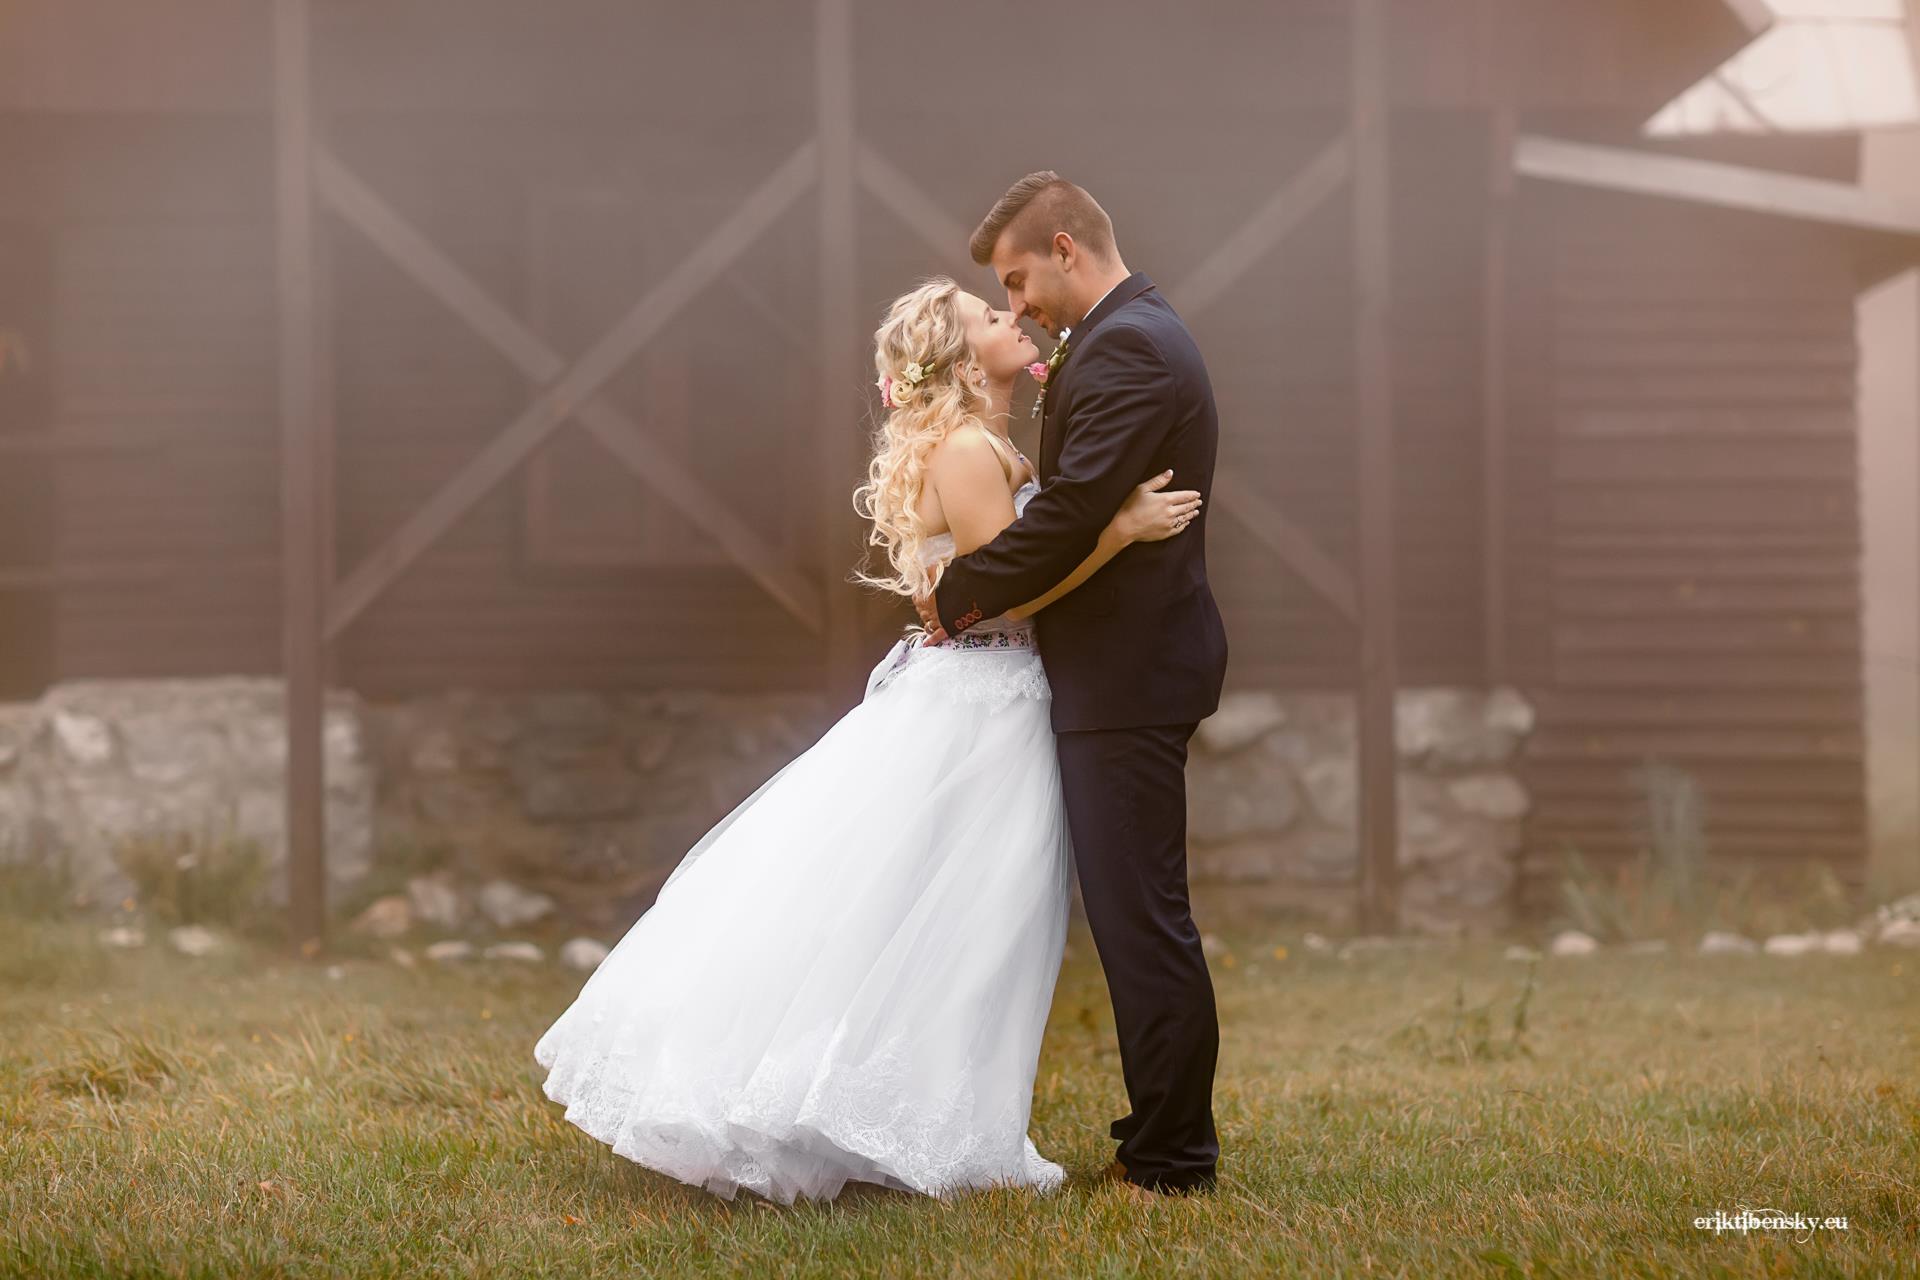 eriktibensky-eu-fotograf-wedding-photo-svadba-svadobny-pezinok-bratislava-modra-senec-1002